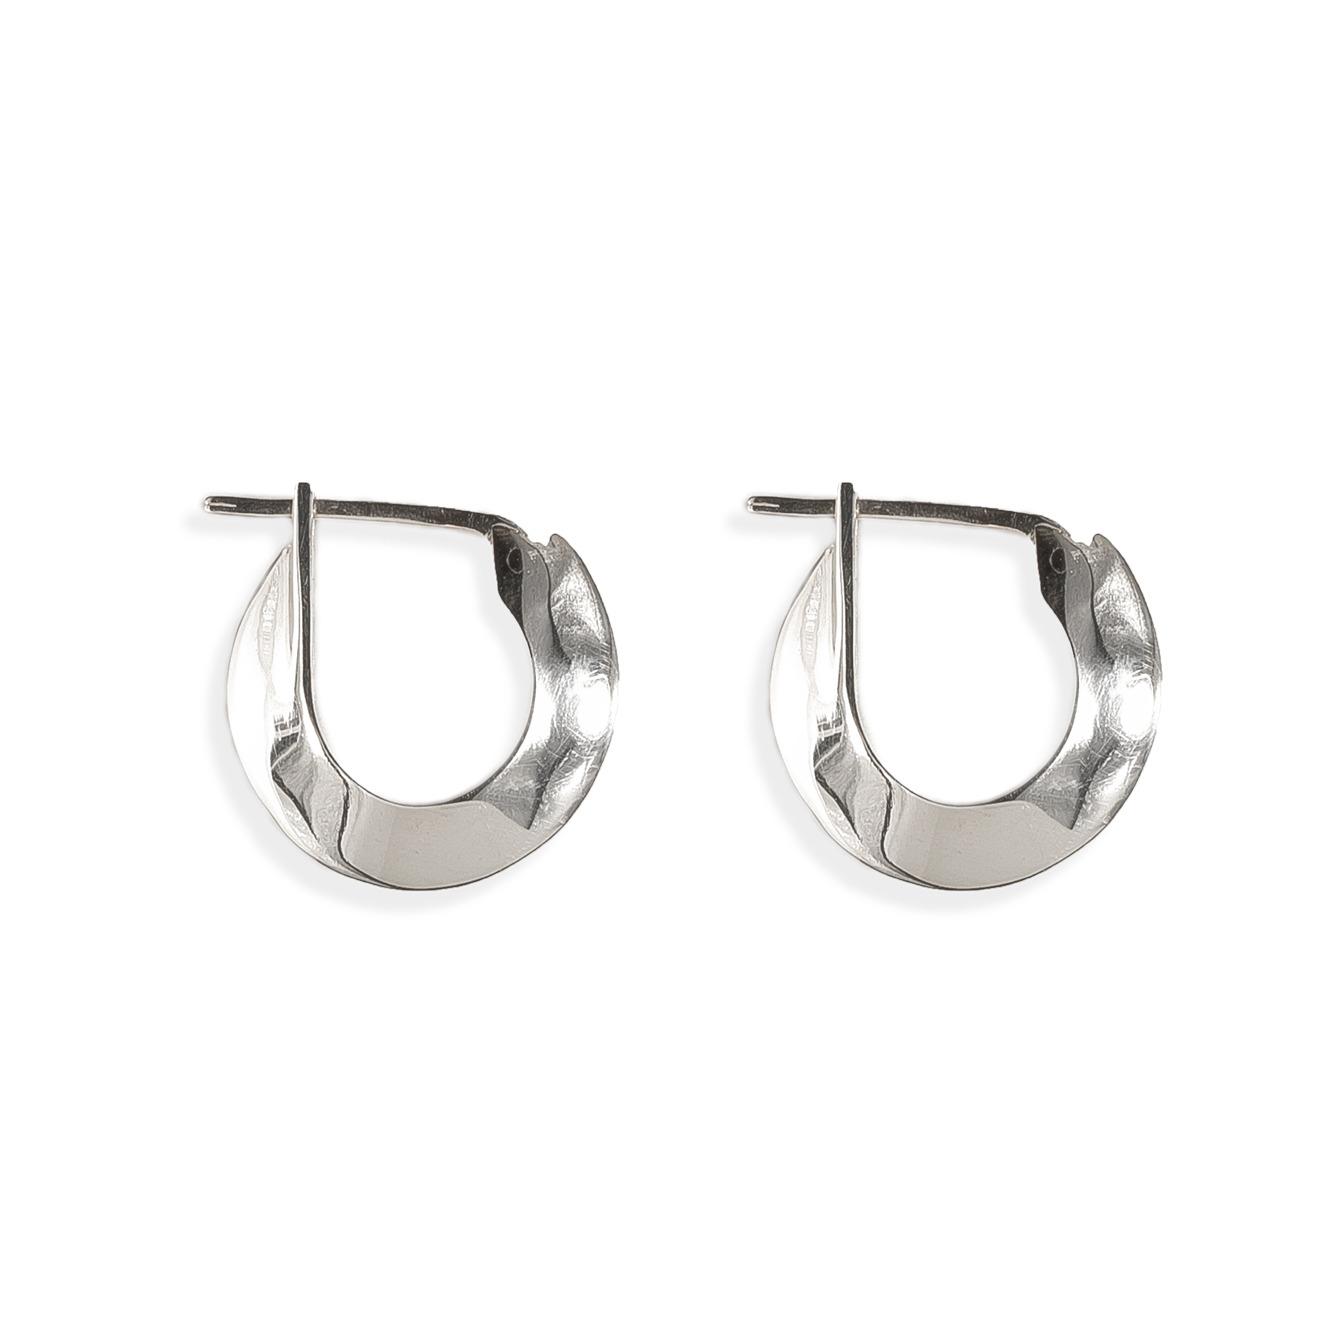 APRIL Серьги-кольца из серебра BASE01 S кольца sokolov 713382 s